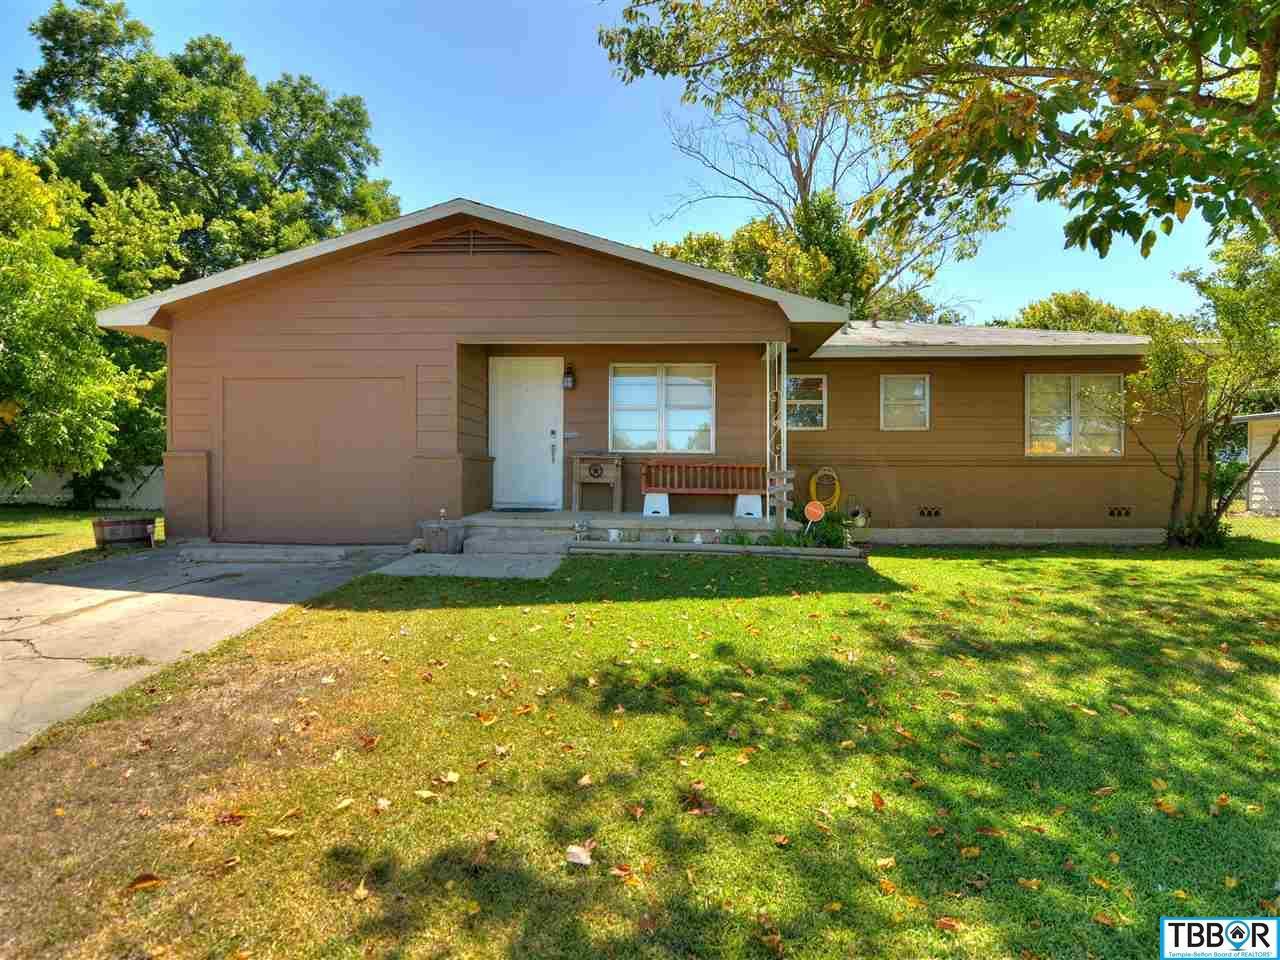 605 S 5th St, Copperas Cove TX 76522 - Photo 1